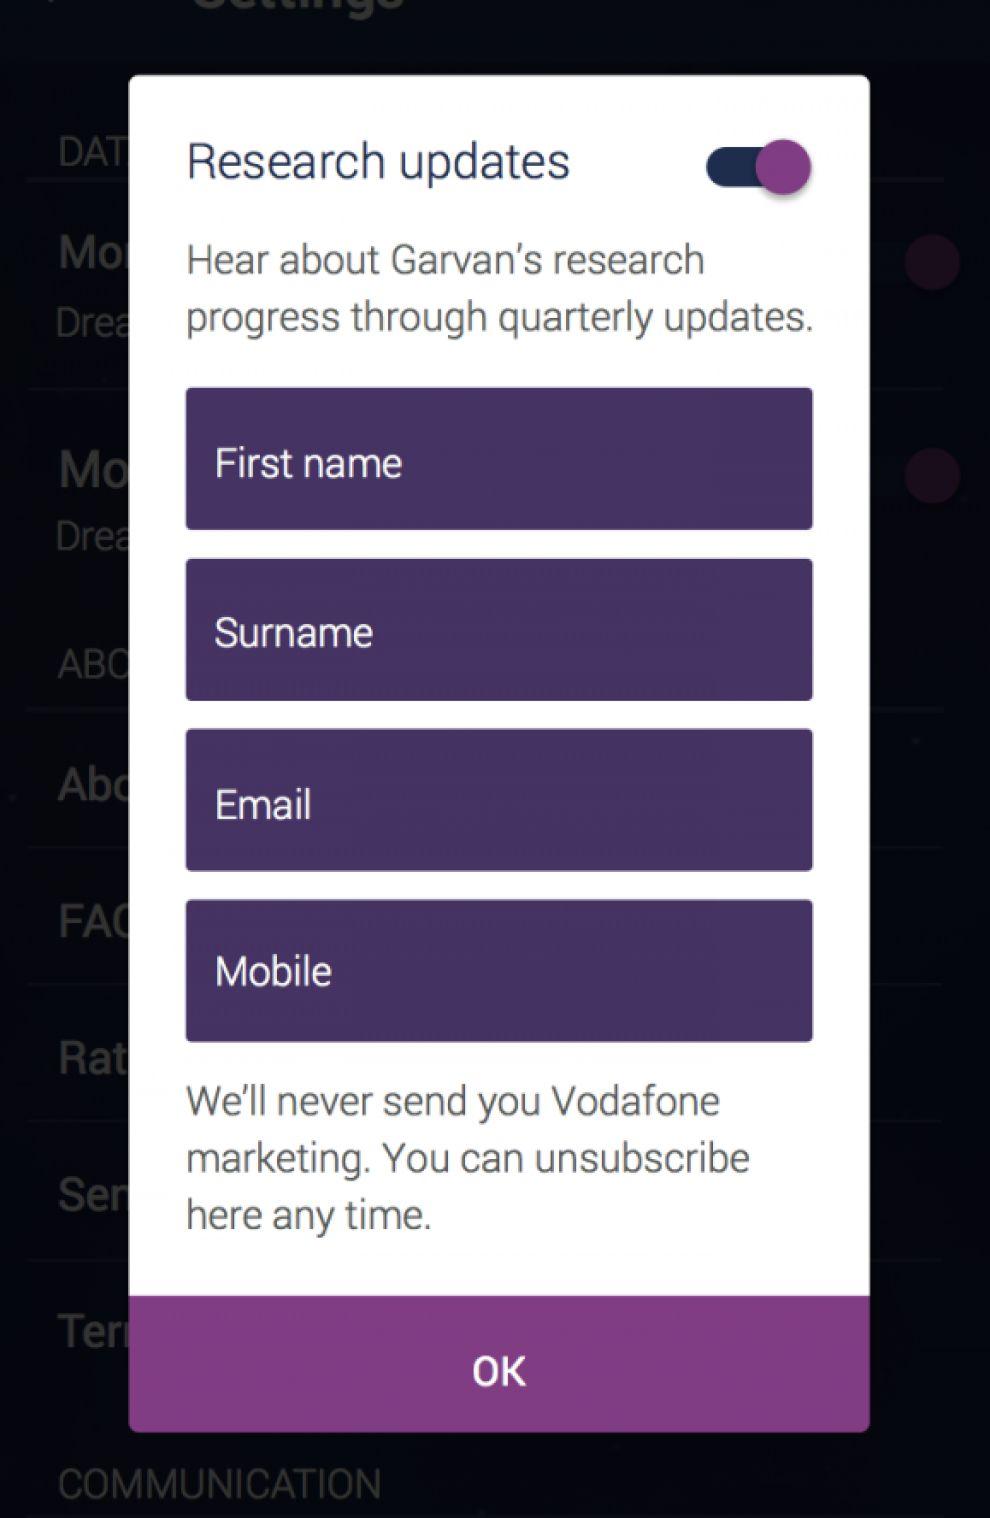 DreamLab Clean App Design